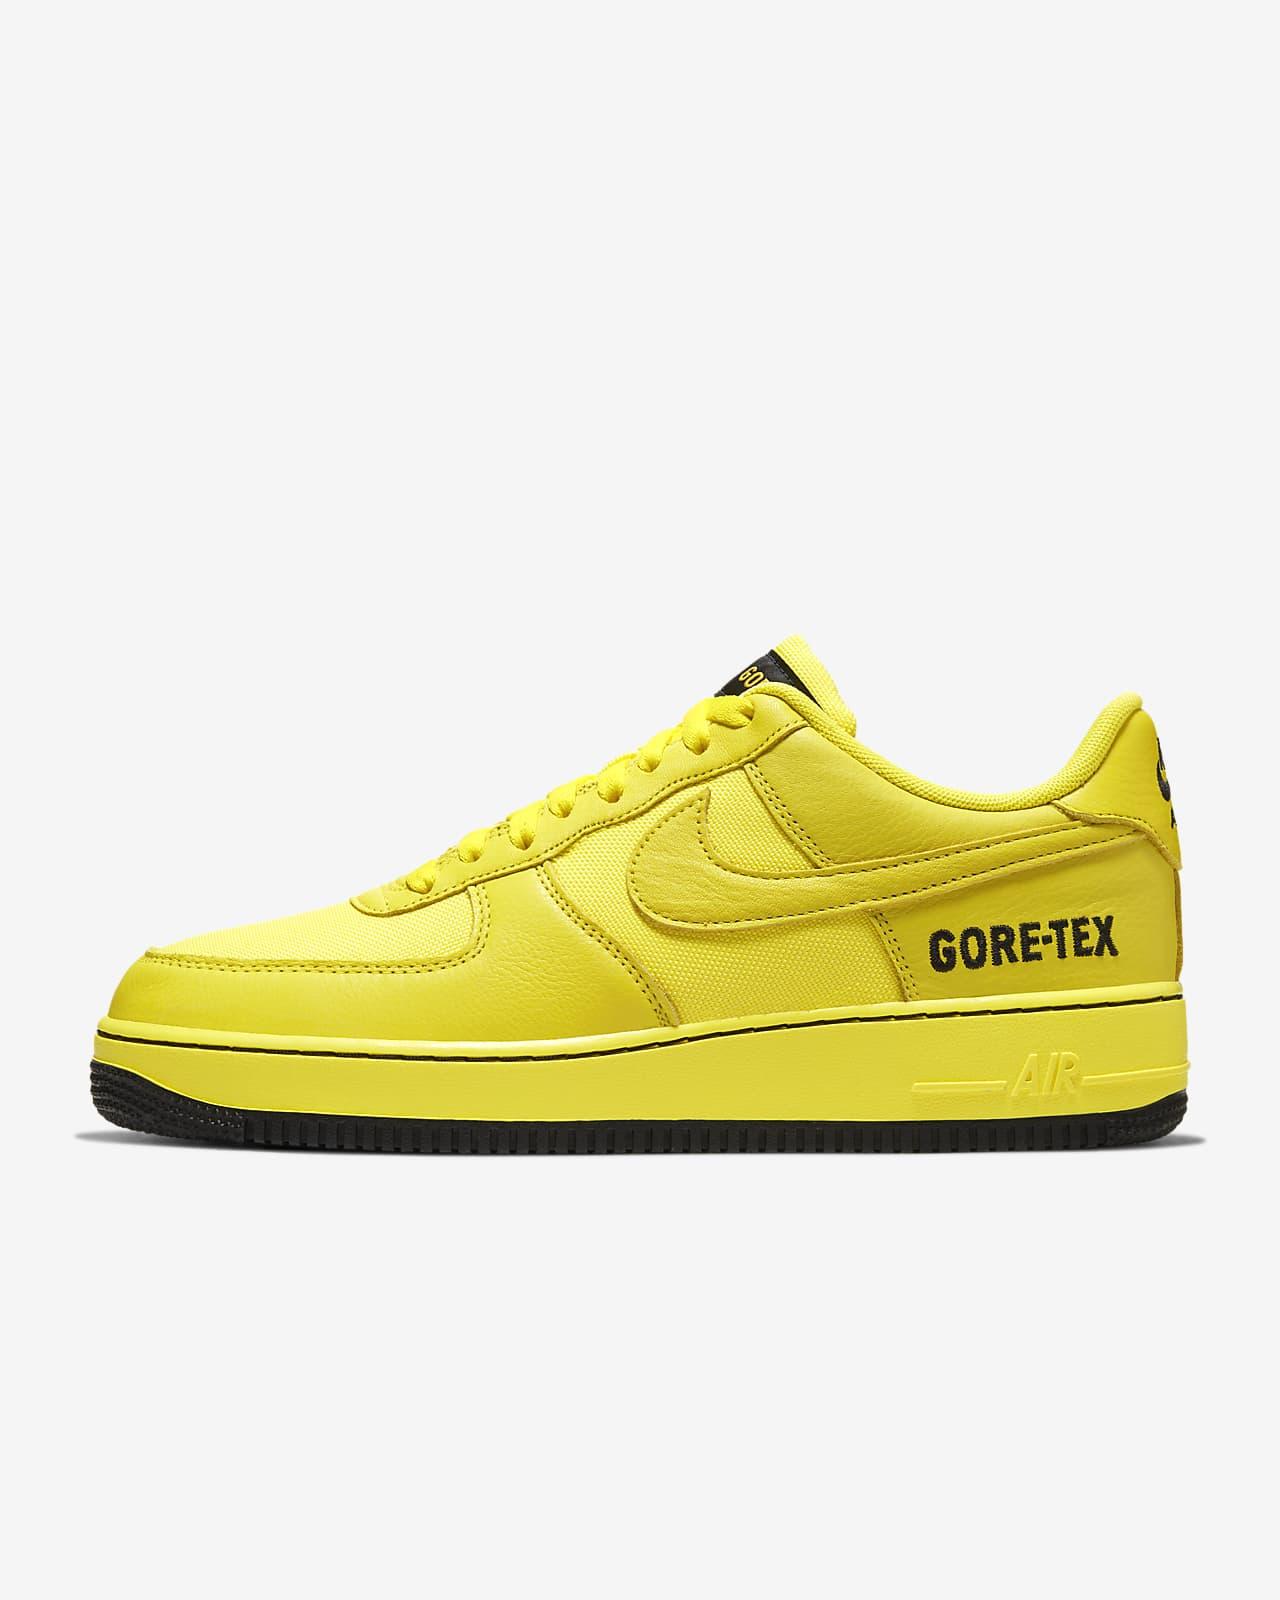 Nike Air Force 1 GORE-TEX Shoes